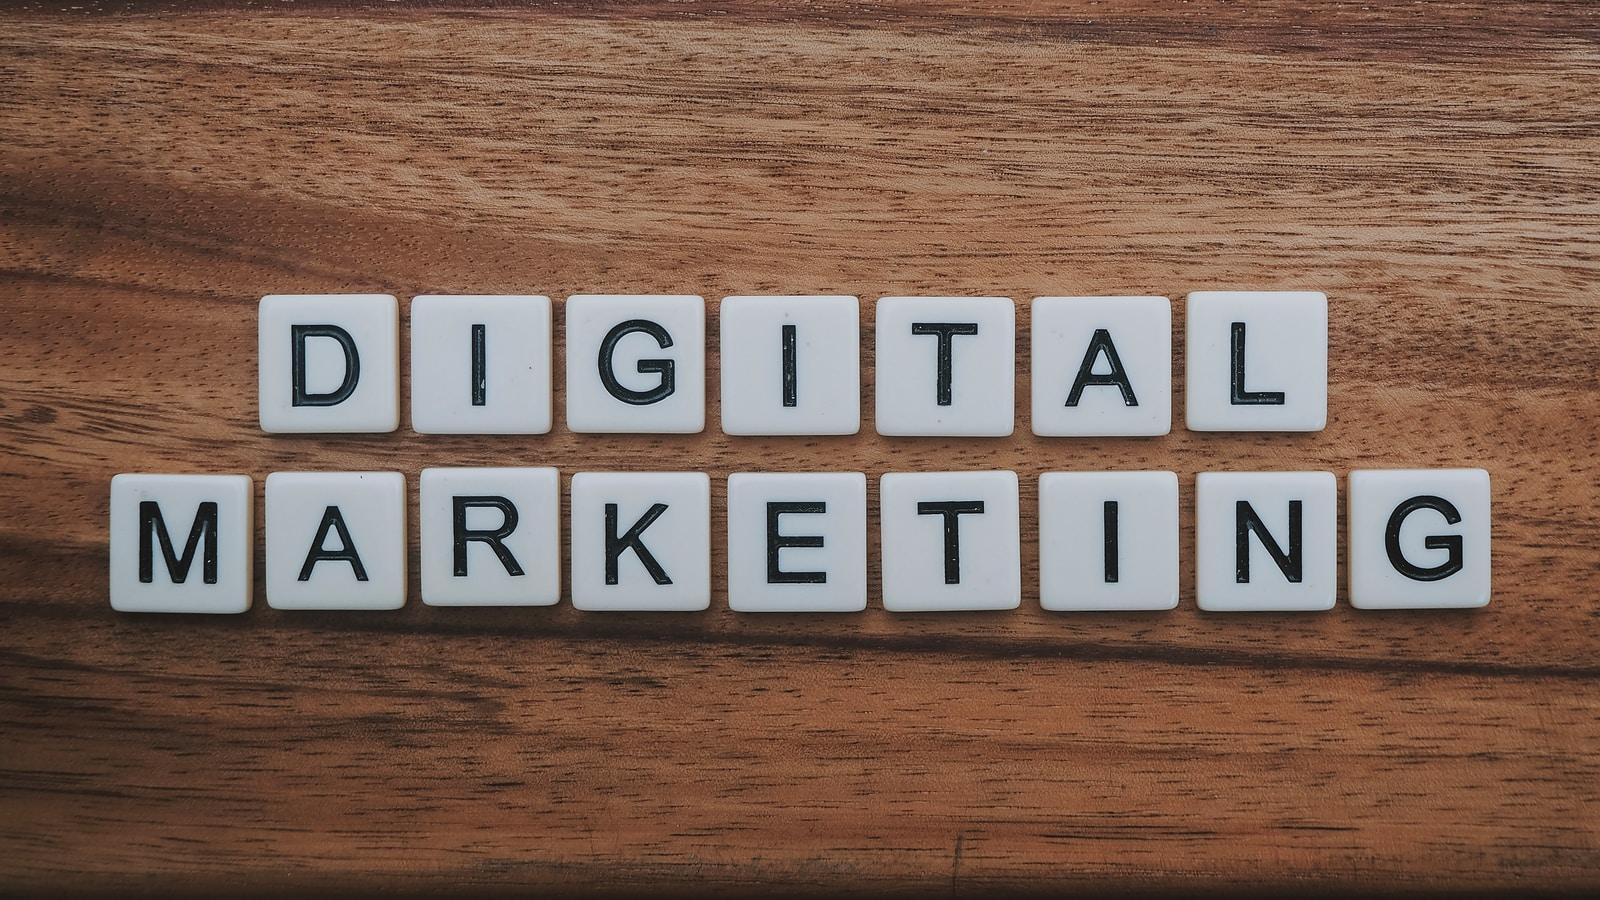 Digital Marketing Strategies for Nonprofits